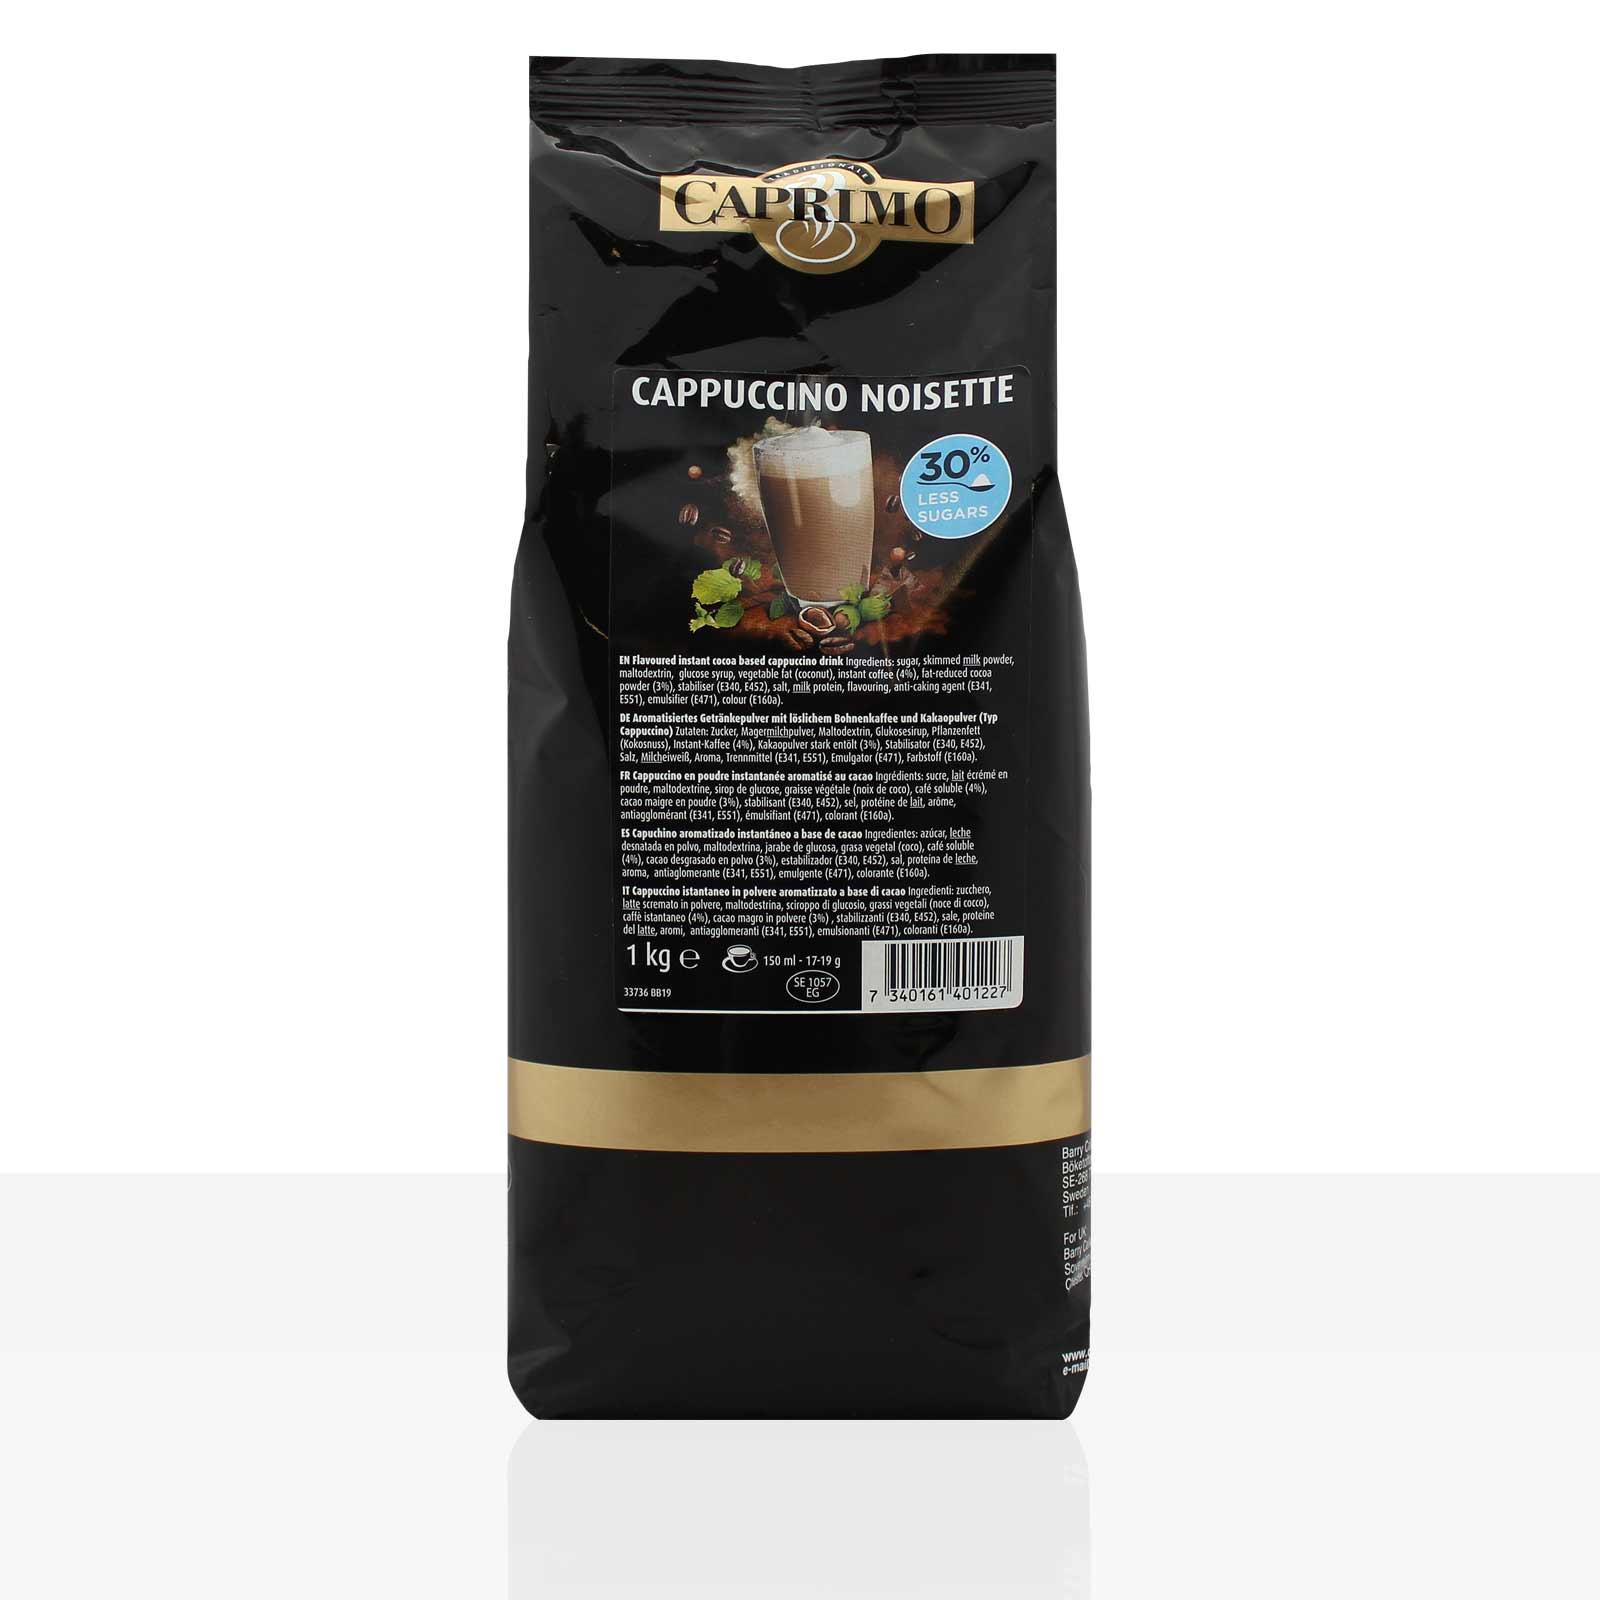 Caprimo Cappuccino Cafe Noisette 1kg Instant